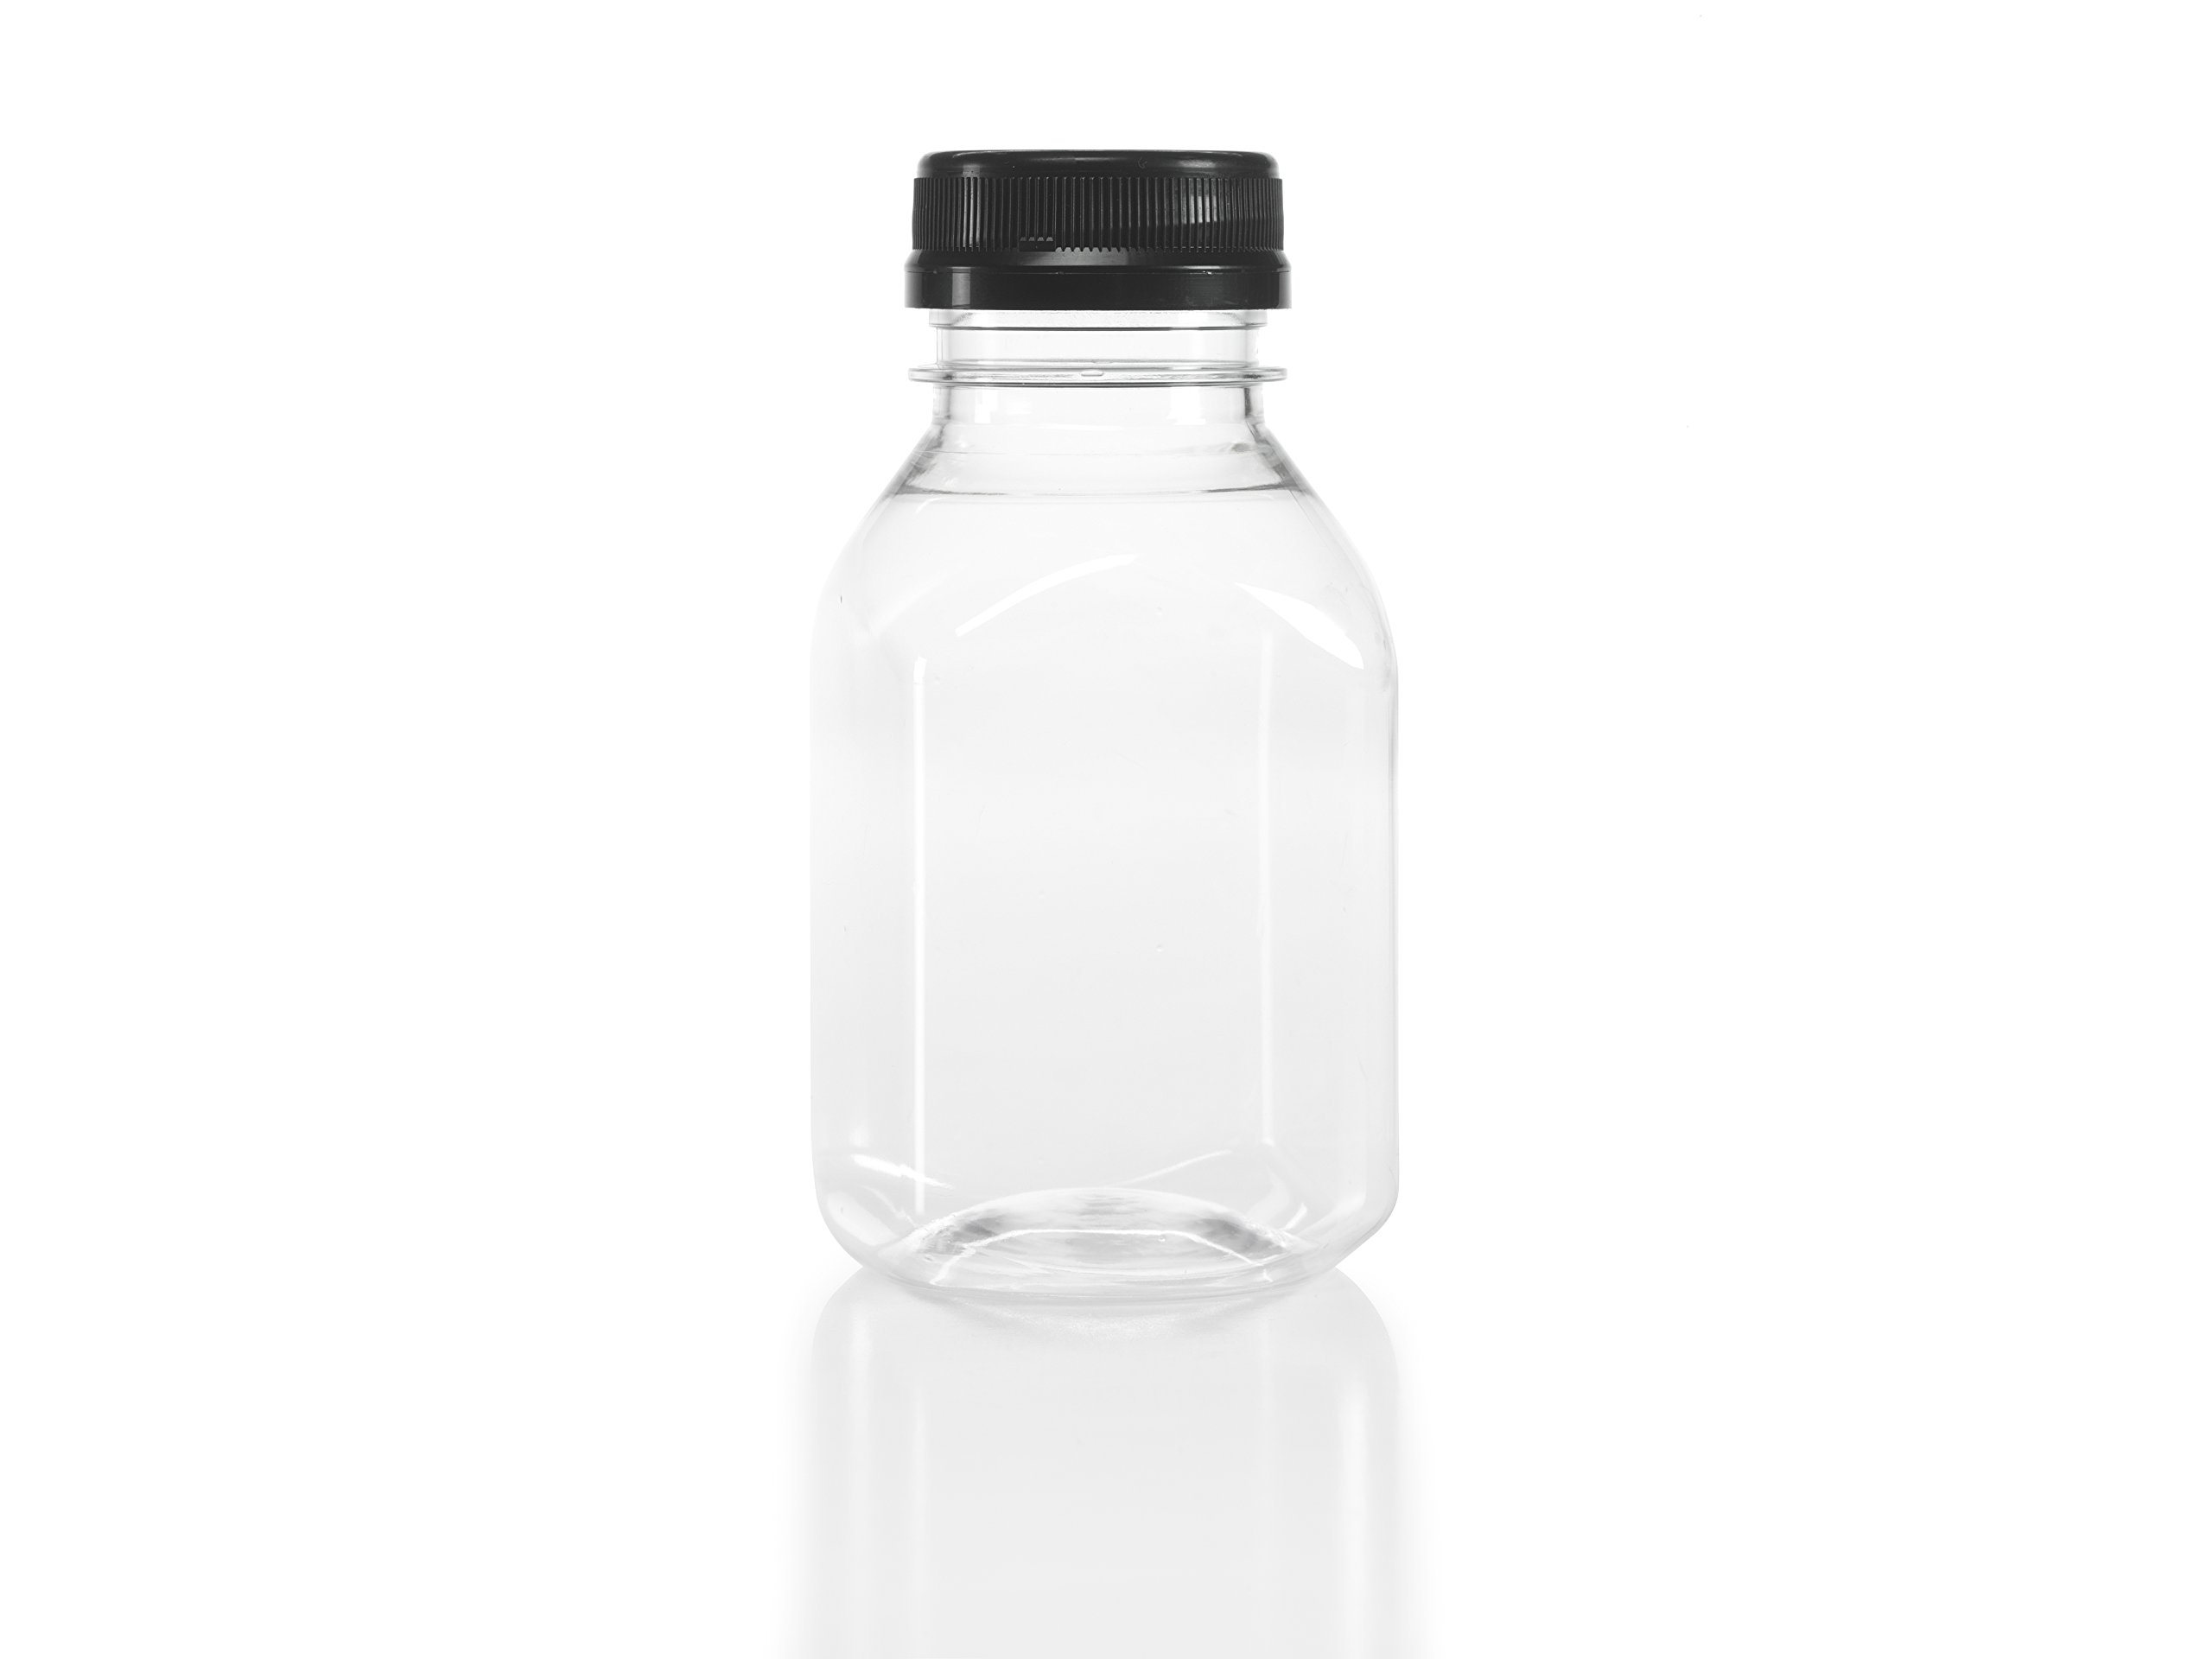 (50) 8 oz. Clear Food Grade Square Plastic Juice Bottles with Black Tamper Evident Caps 50/Pack